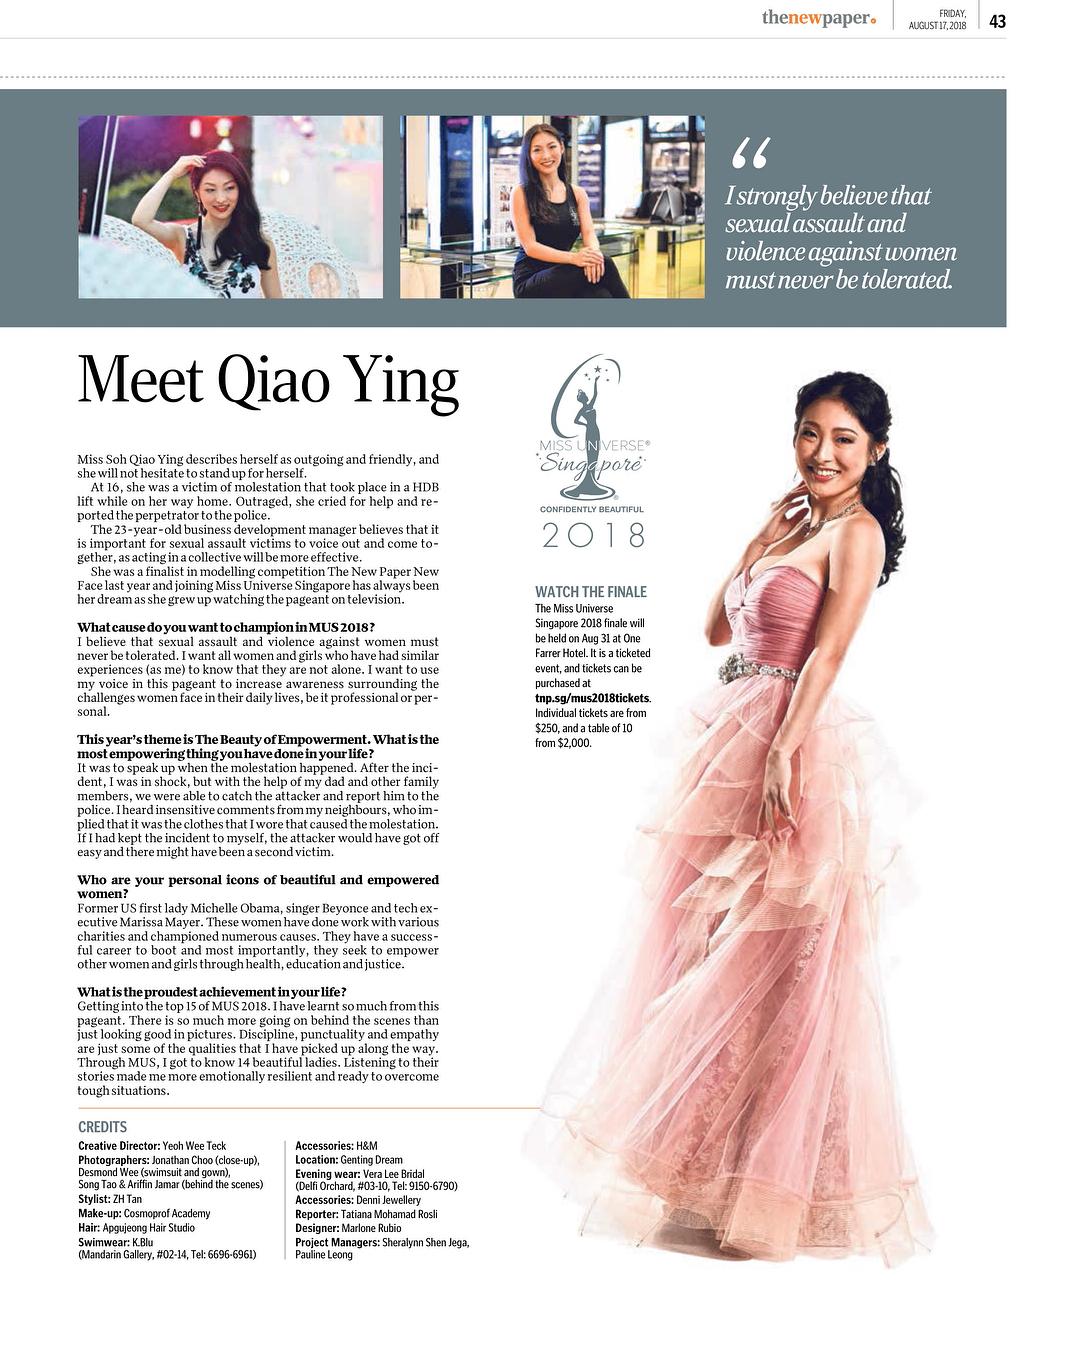 candidatas a miss universe singapore 2018. final: 31 agosto. - Página 5 Fmz8qk63